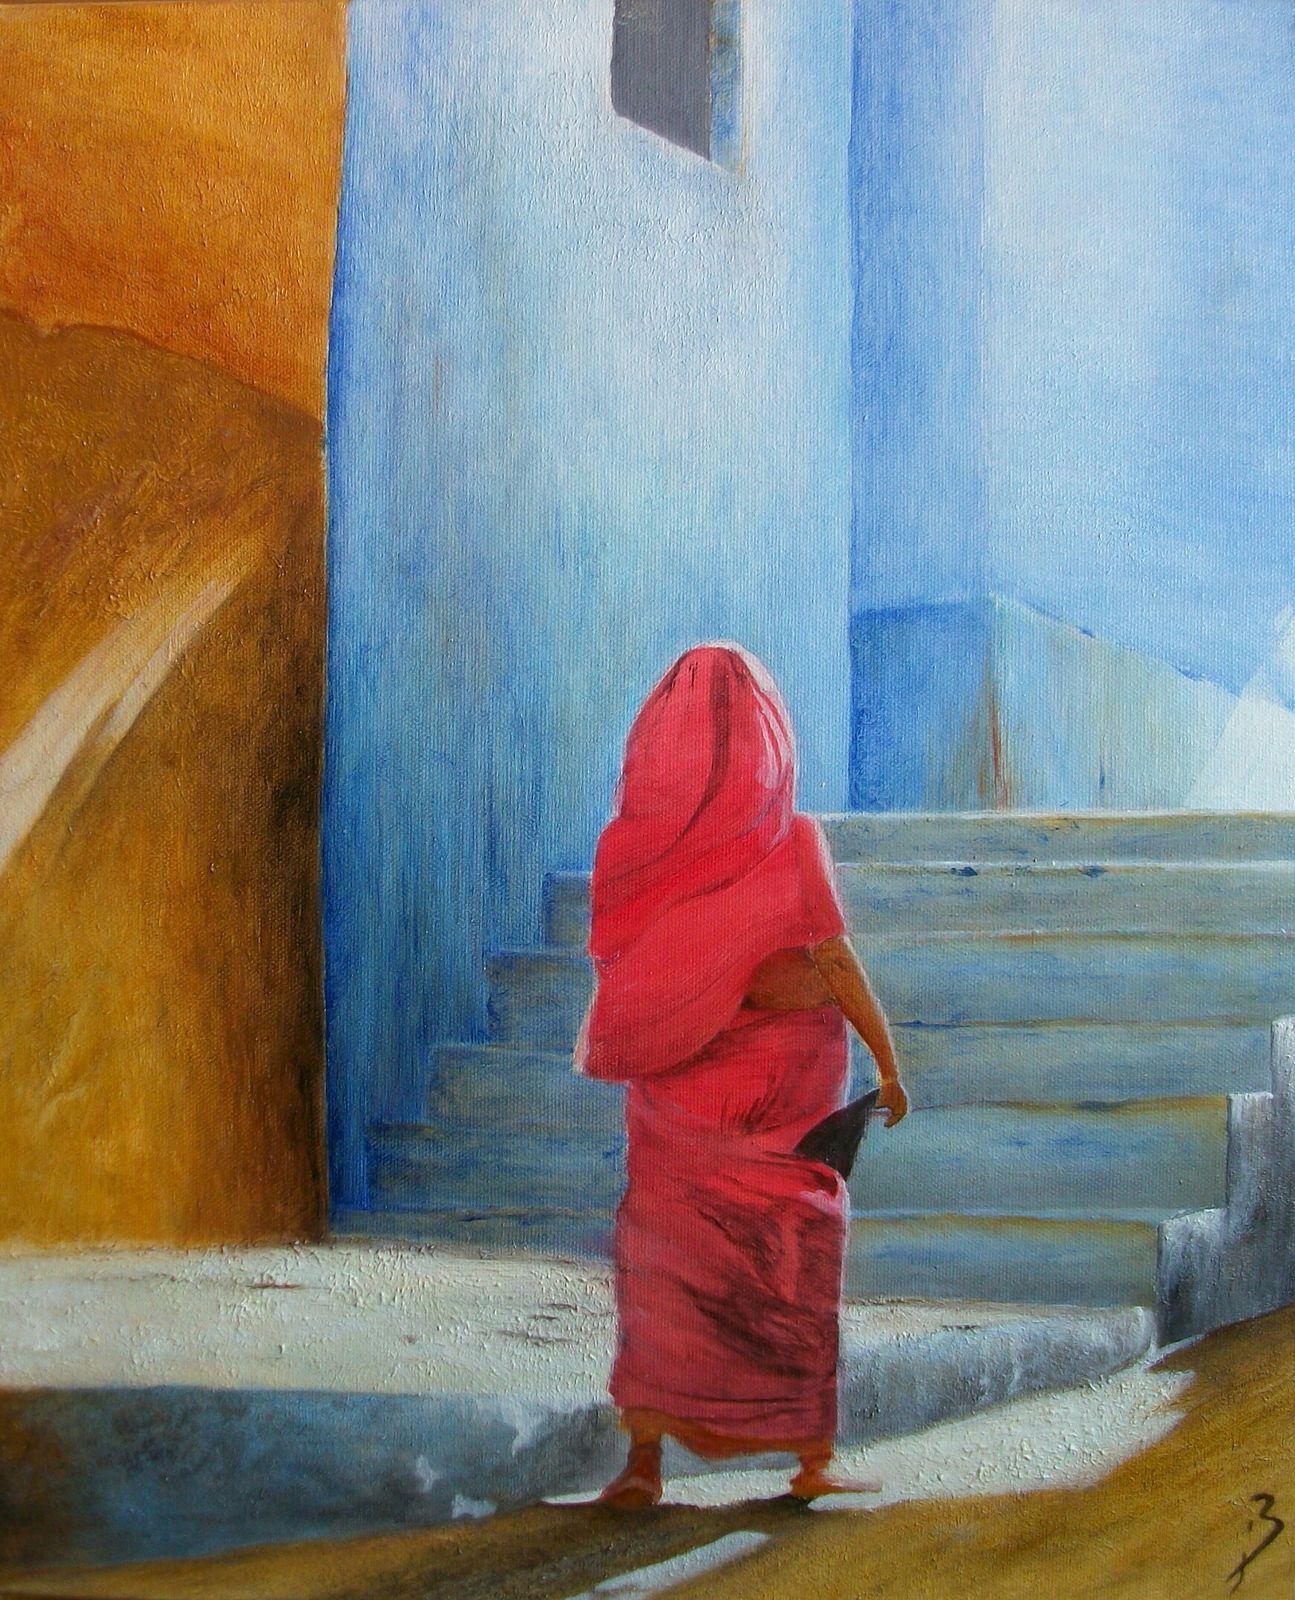 La Dame en rouge - Djerba - taille : 38x46 cm - Disponible